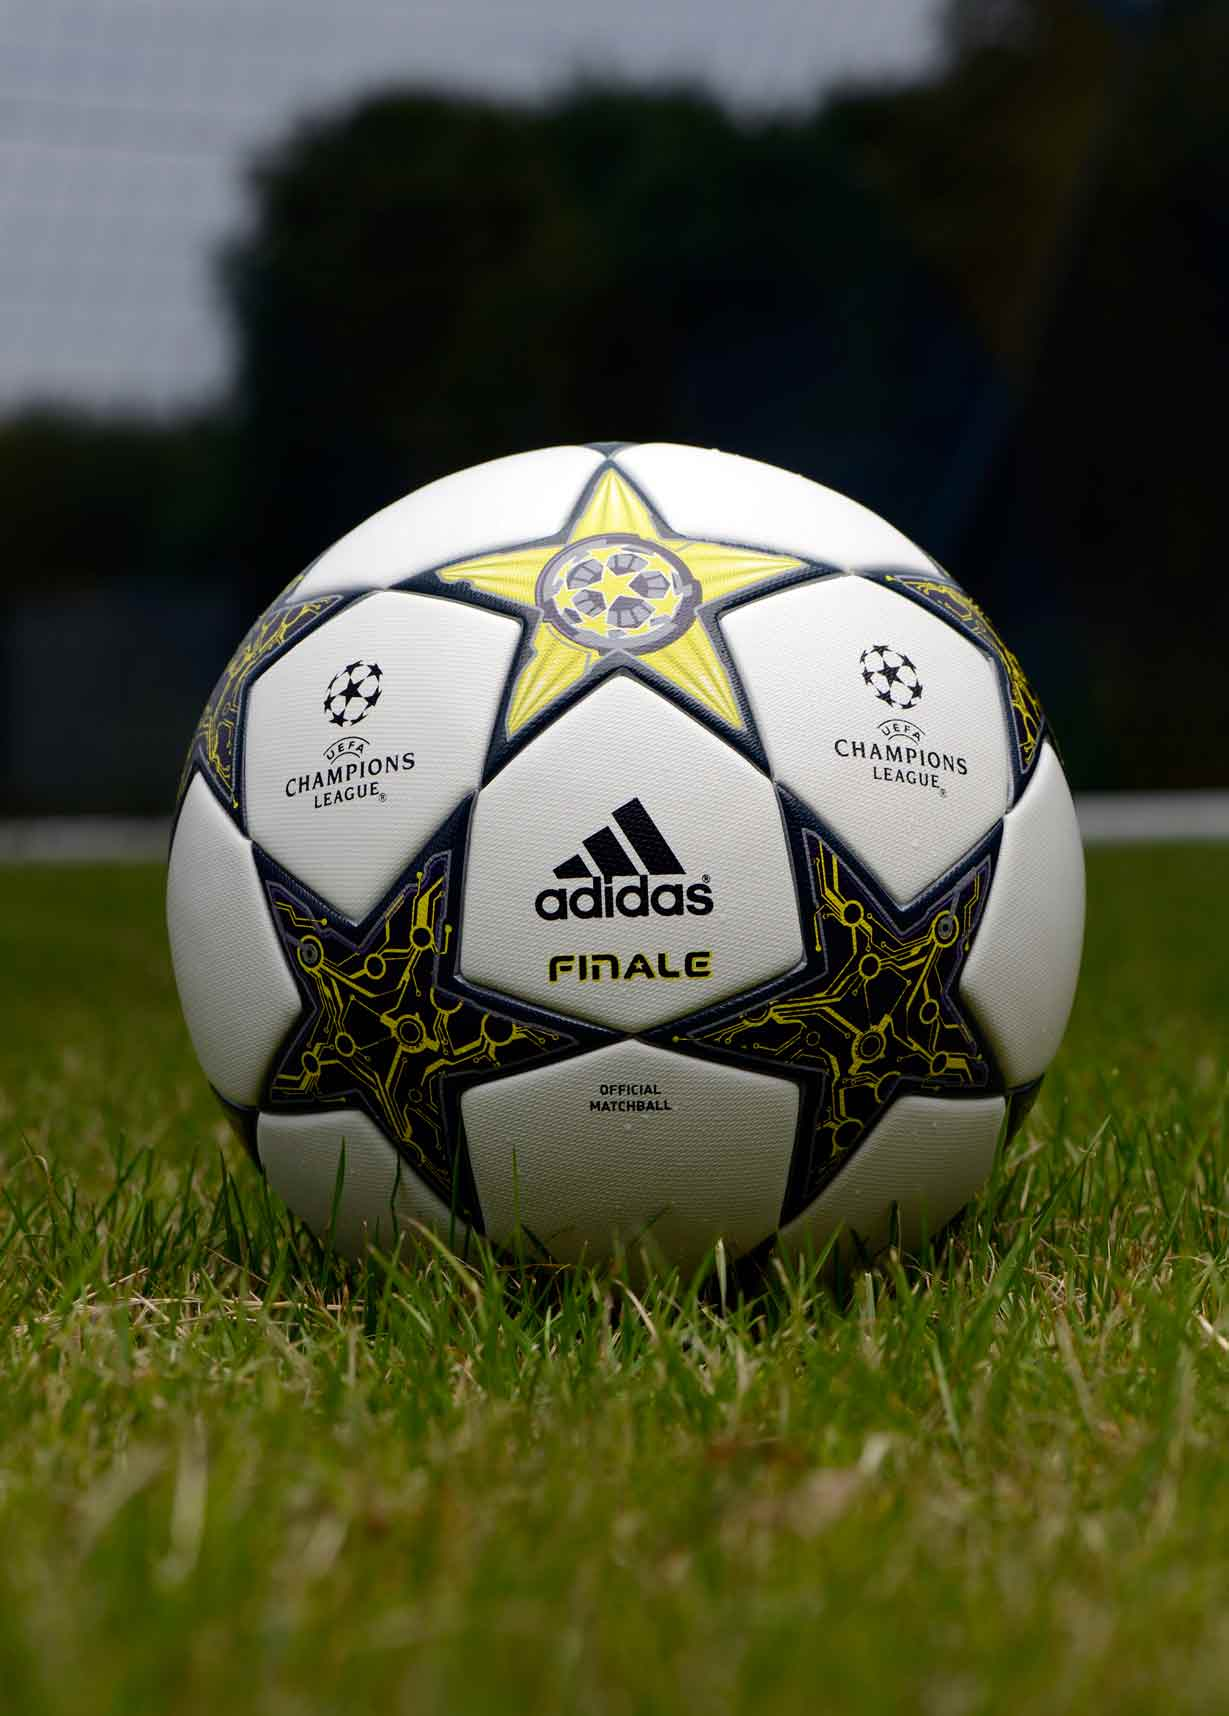 мяча лч 2012-2013 Adidas Finale 12